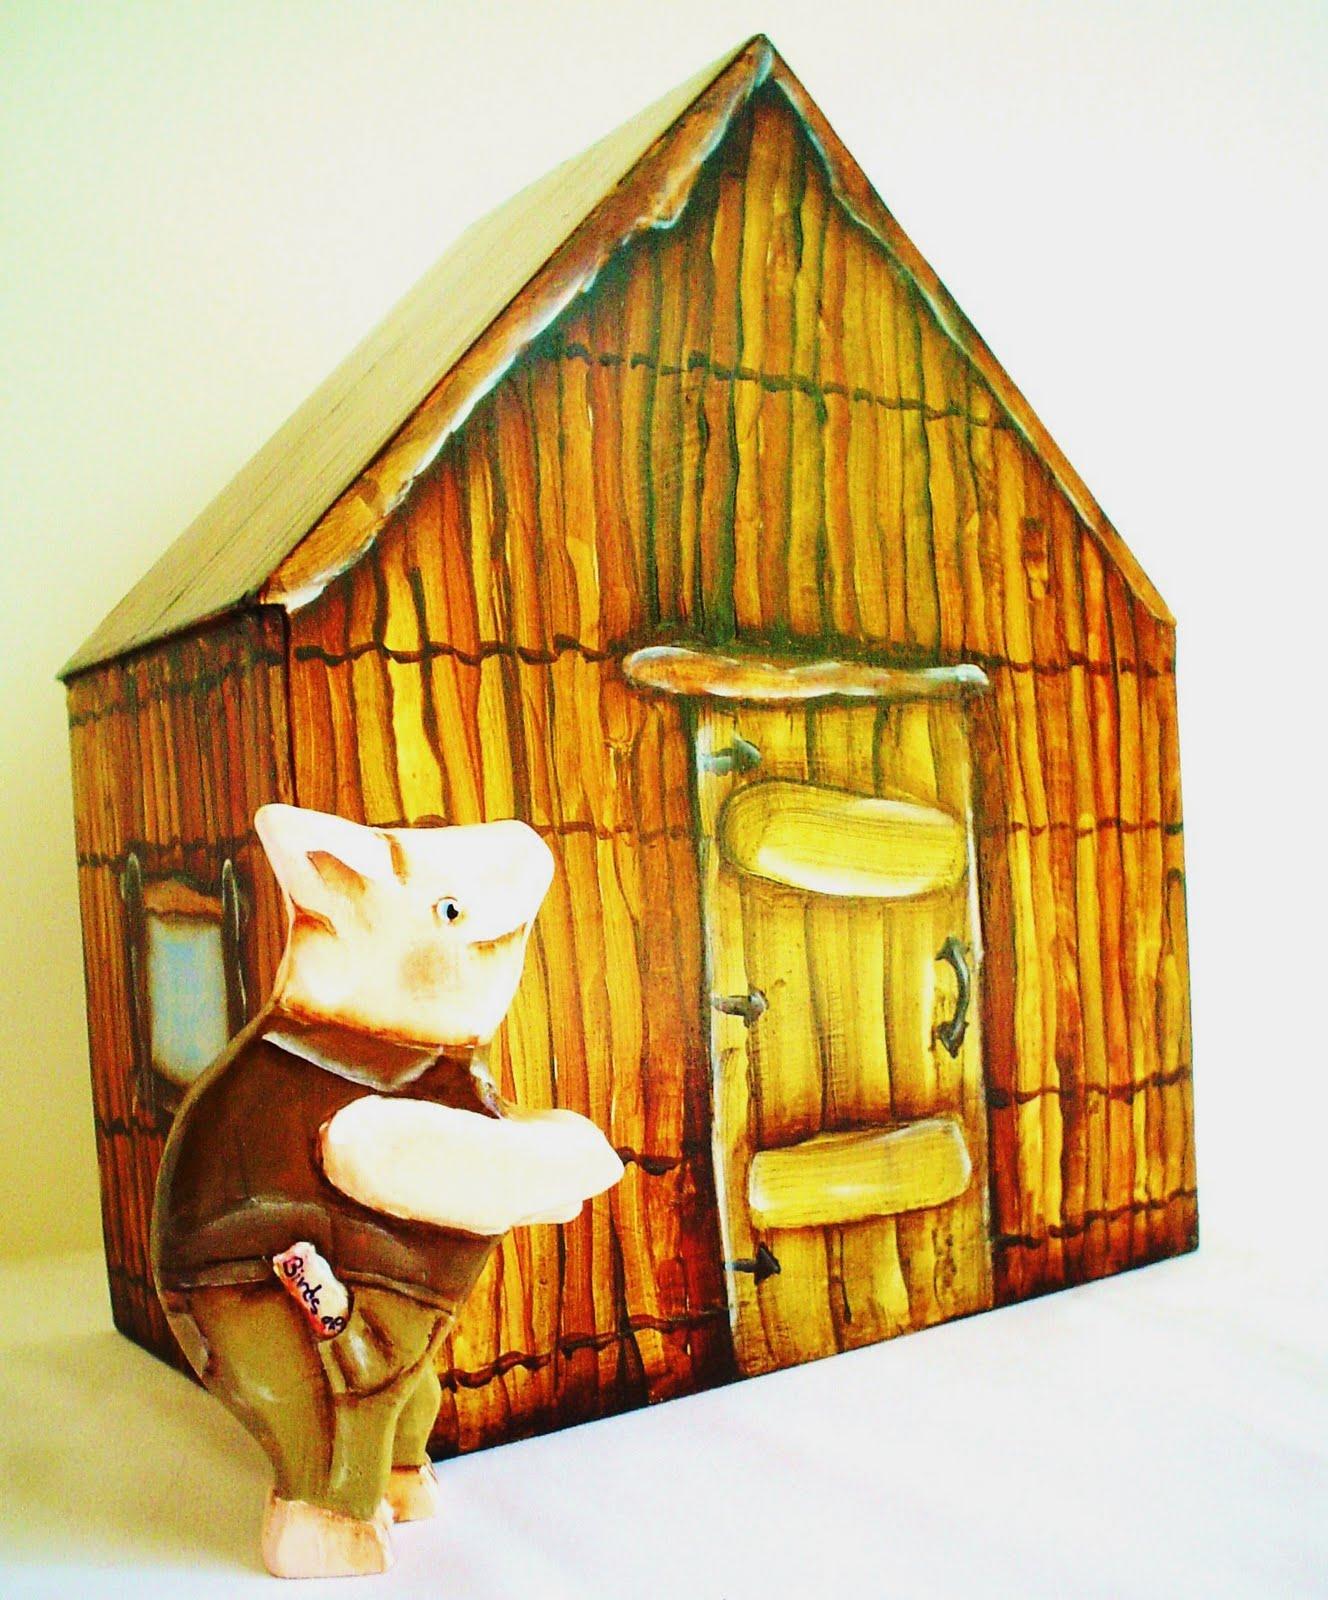 Three Little Pigs Stick House